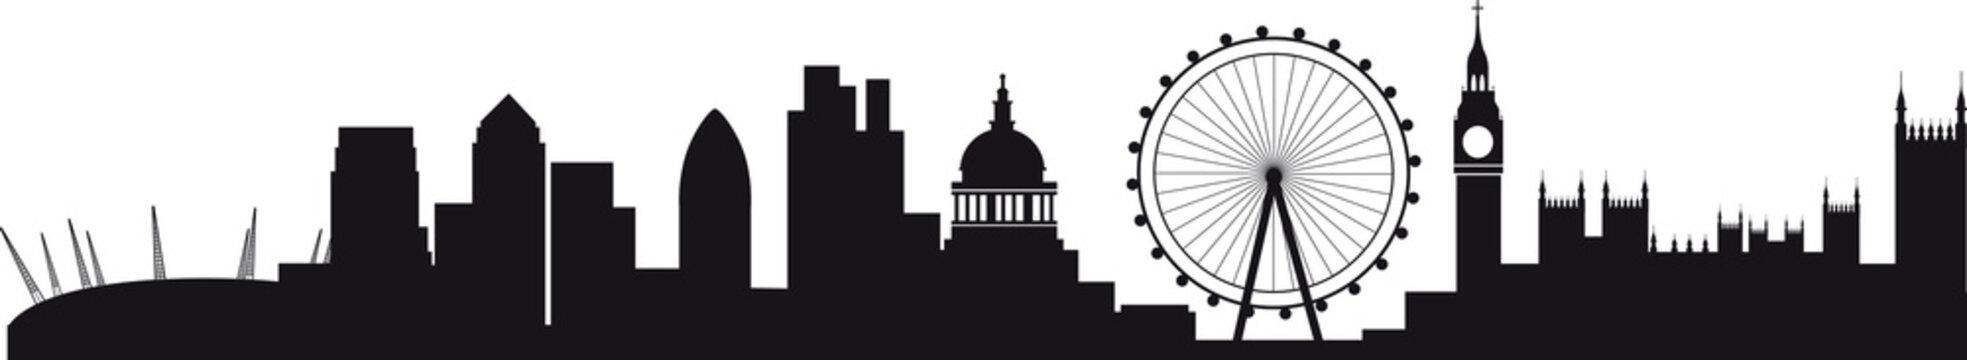 Detailed silhouette of london skyline